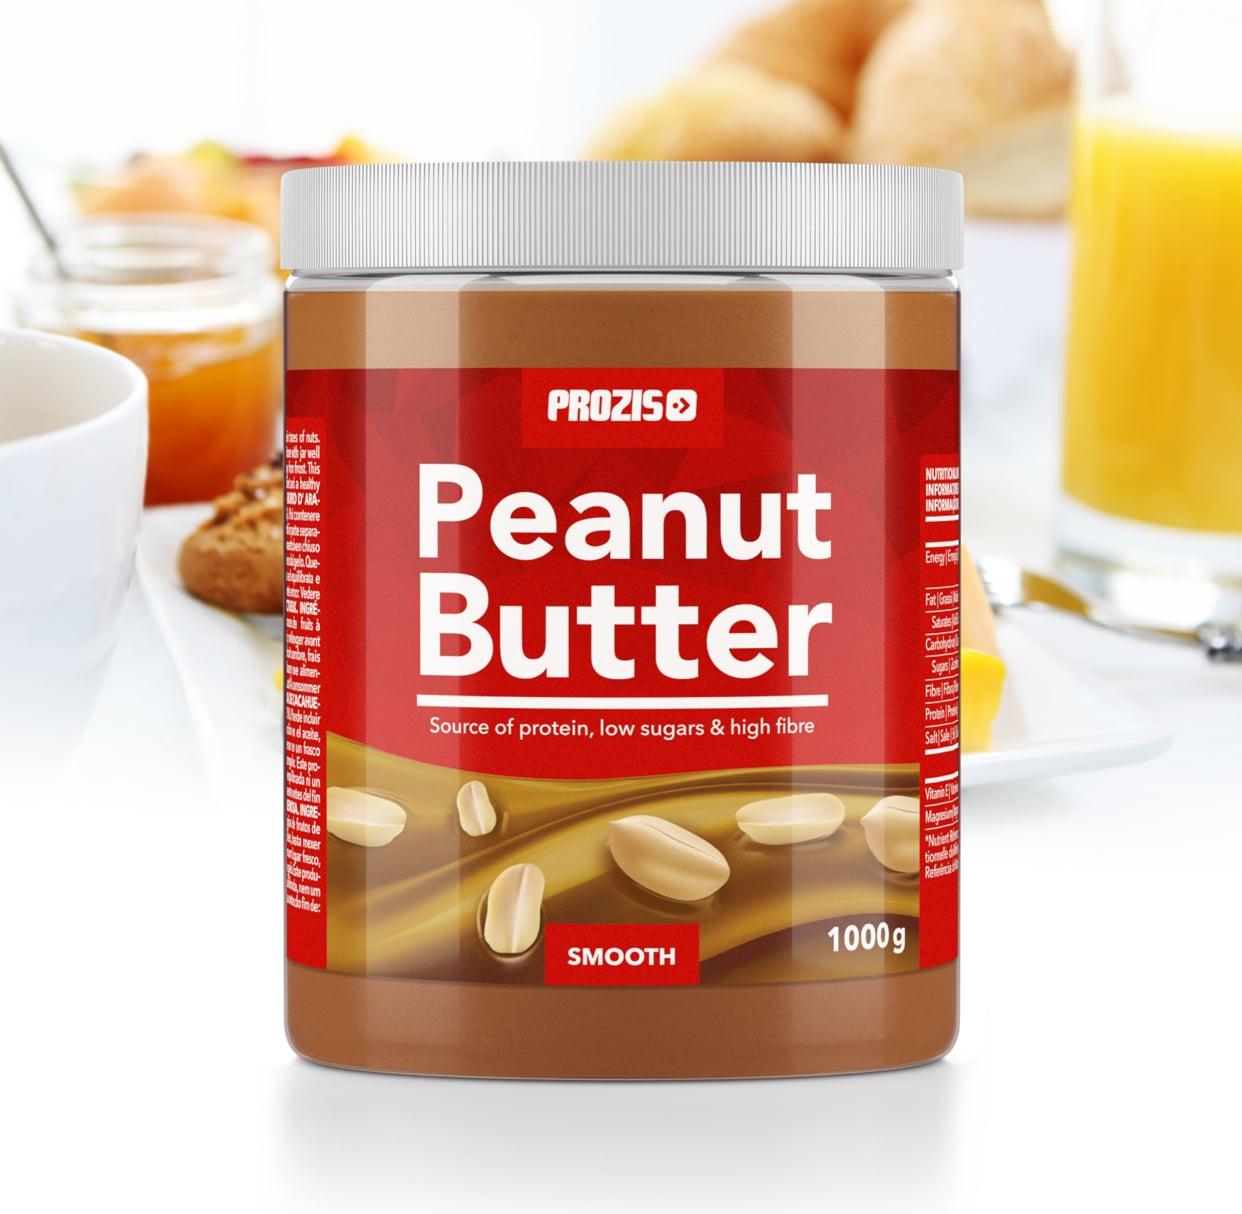 Prozis Peanut Butter